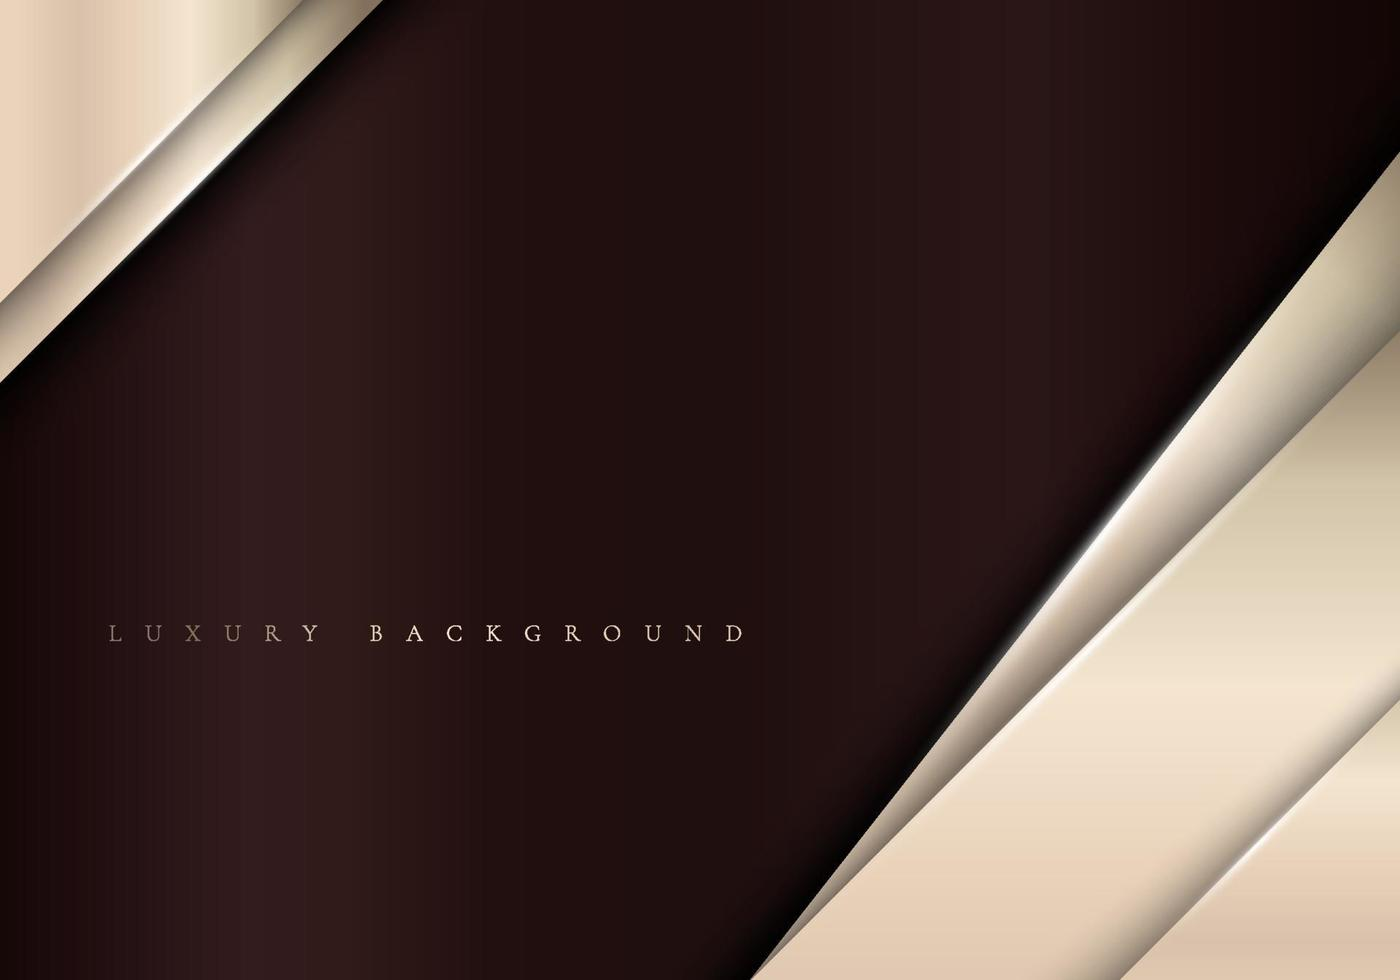 Elegant metallic template background with diagonal golden stripes luxury style. vector